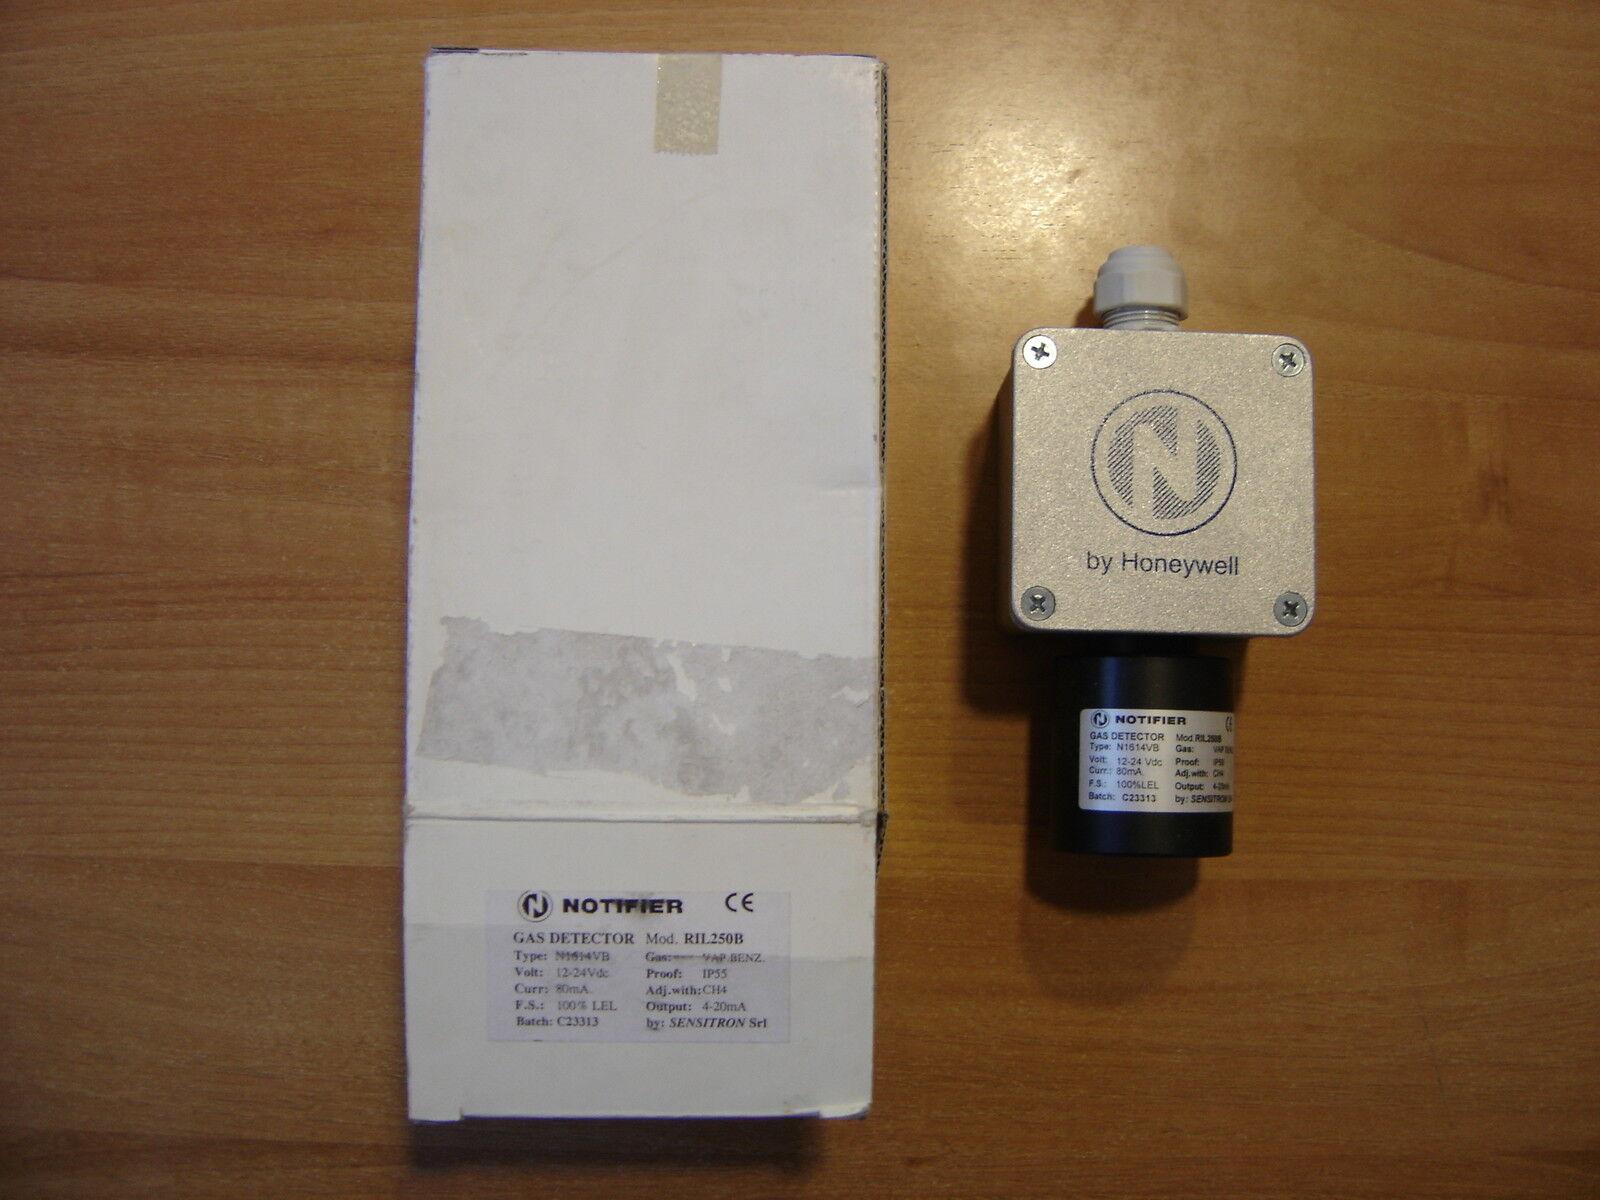 Schemi Elettrici Notifier : Notifier ril vulgas vcc rivelatore gas metano ebay